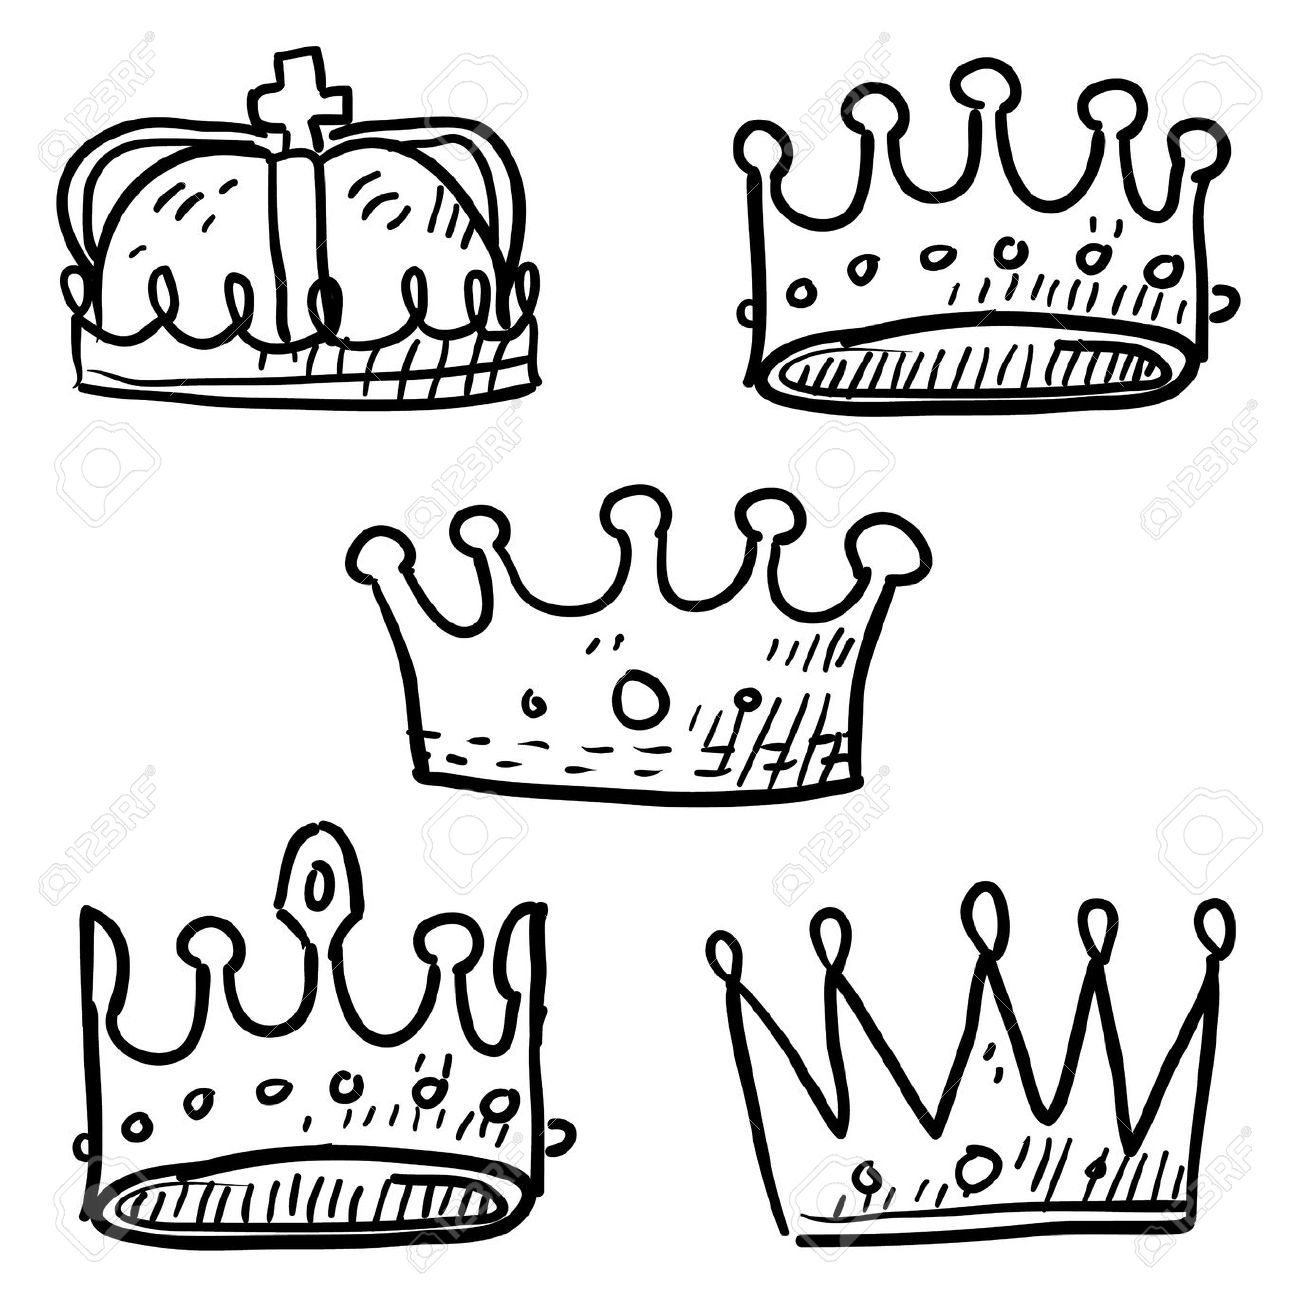 Image Result For Royal Doodles Crown Drawing Line Doodles Bible Art Journaling